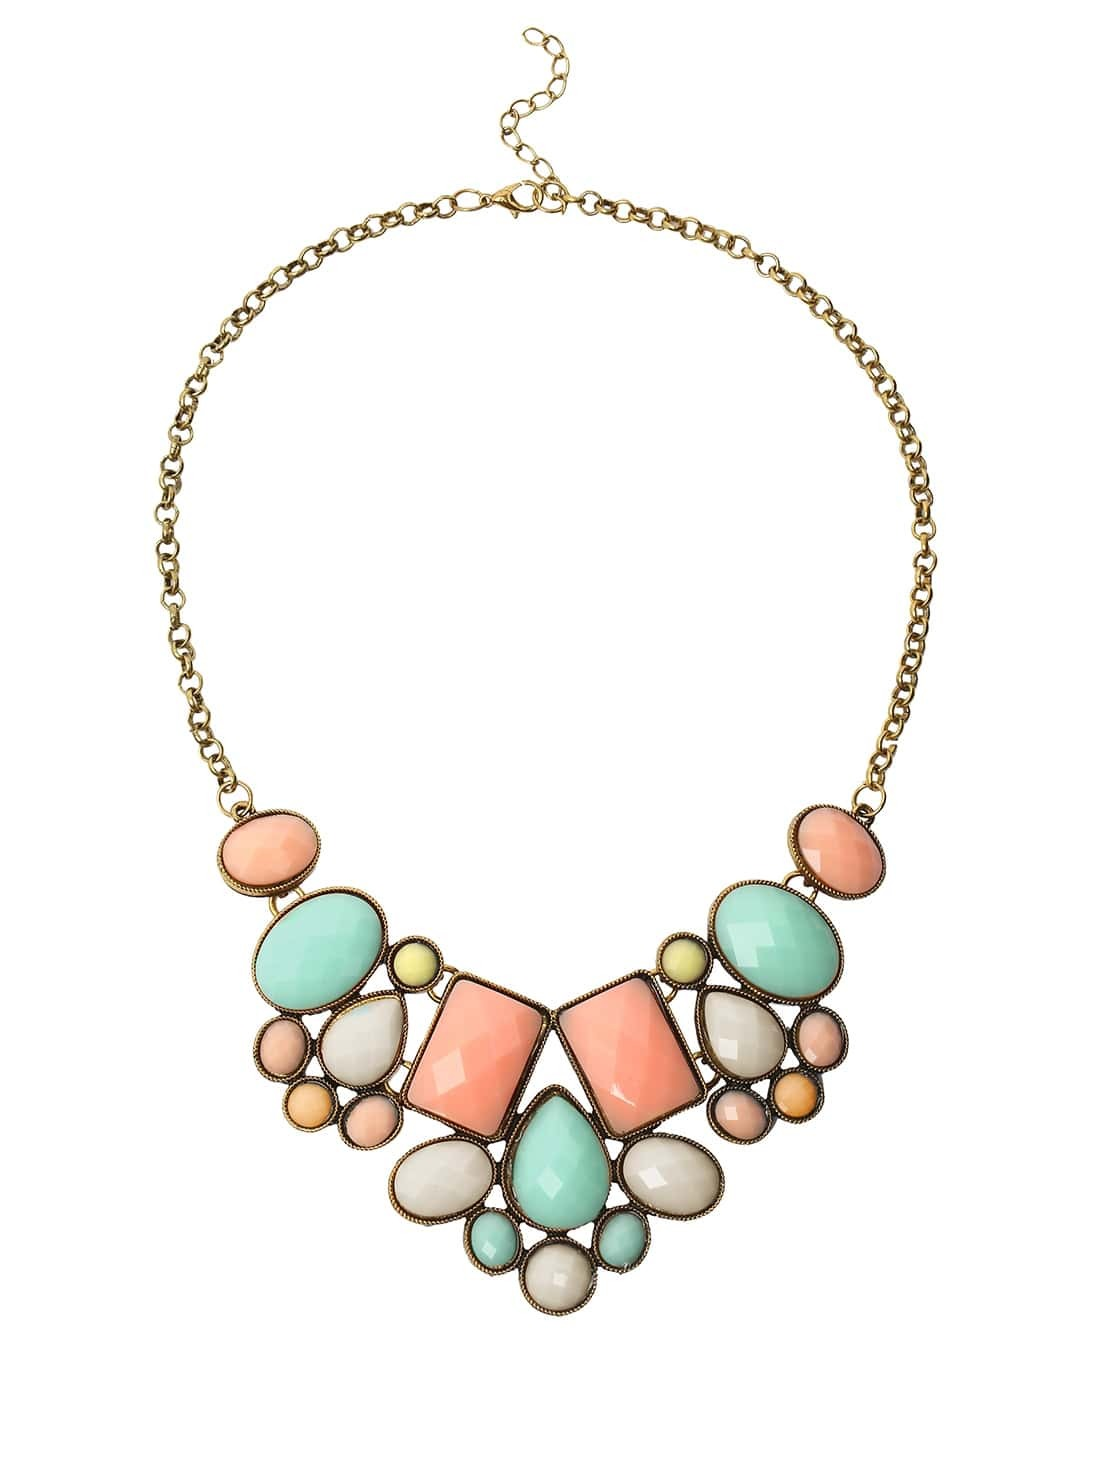 Фото Faux Stone Bib Necklace - Multicolor. Купить с доставкой